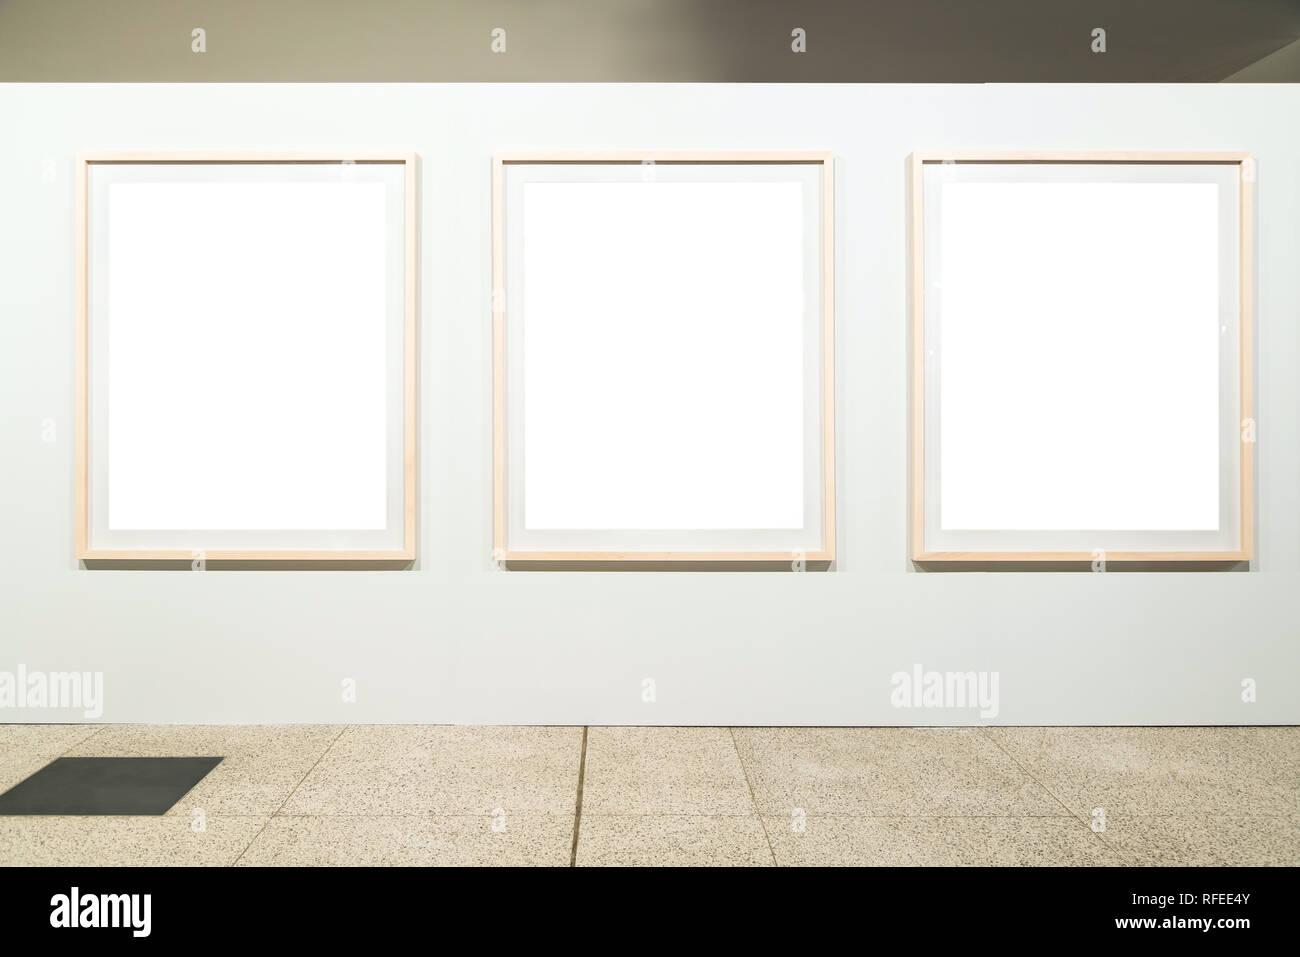 Blank empty golden frame on white background. Art gallery